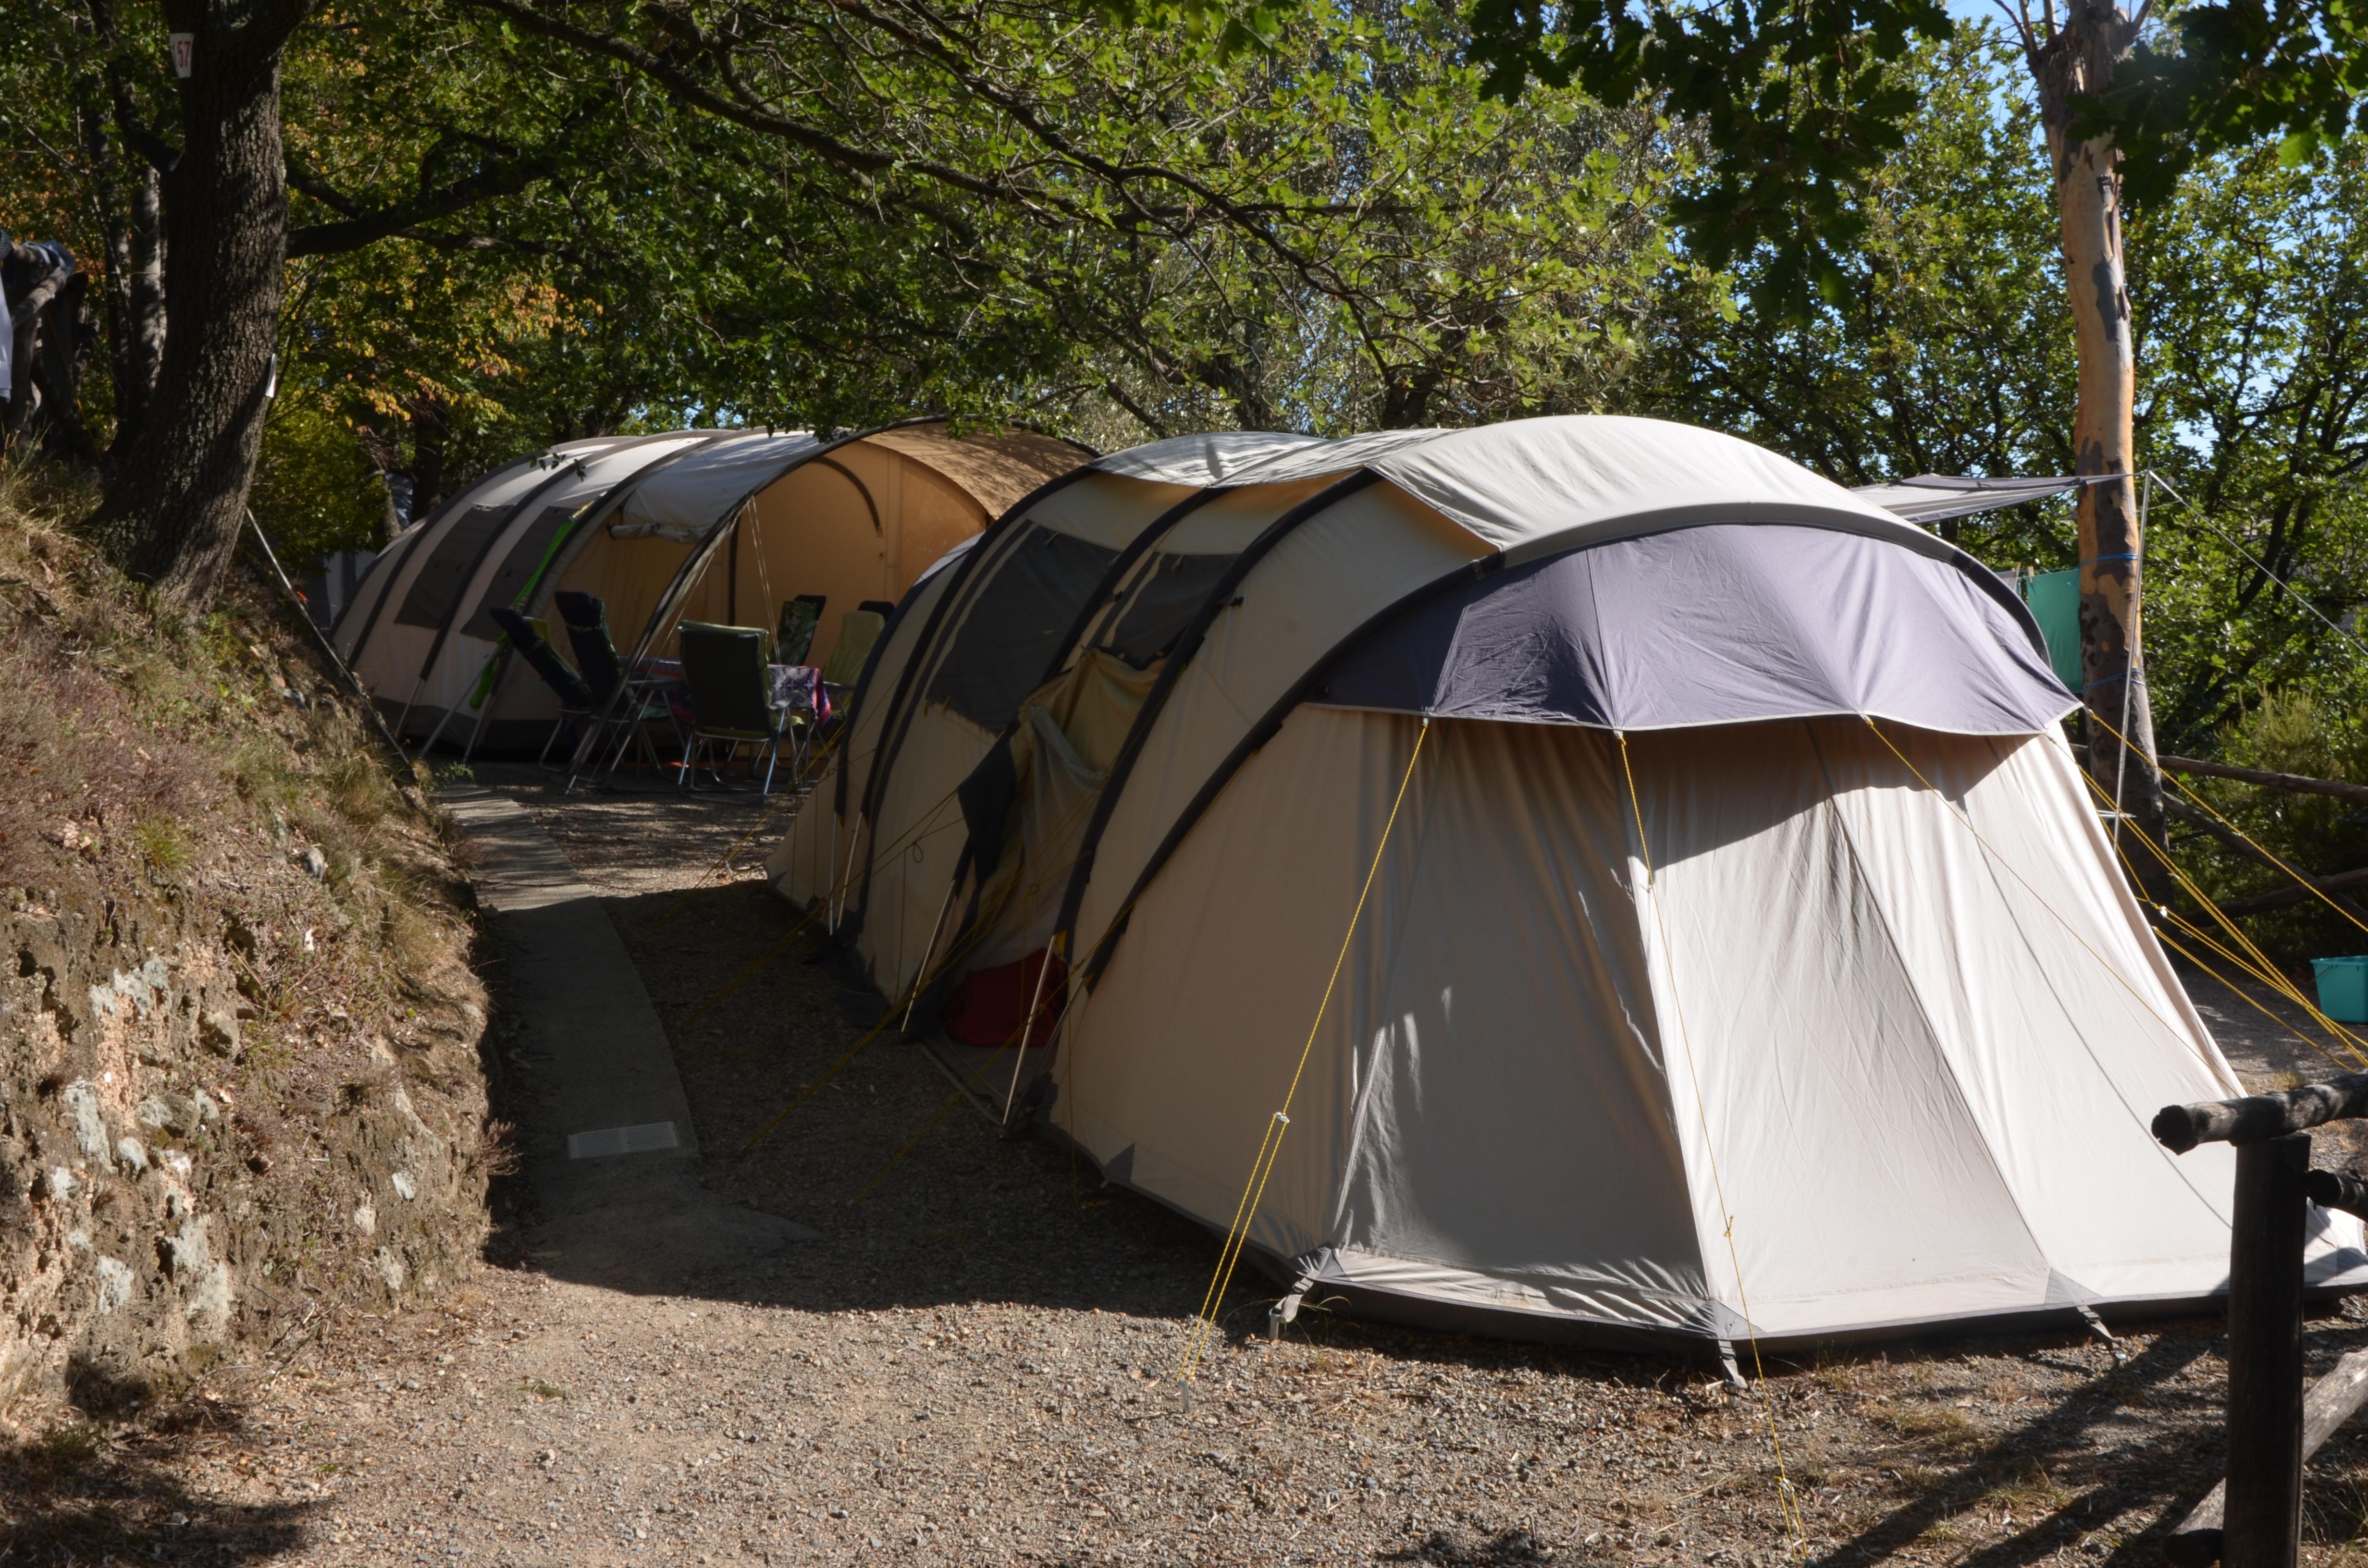 Emplacement - Emplacement Tente - Camping Pian dei Boschi